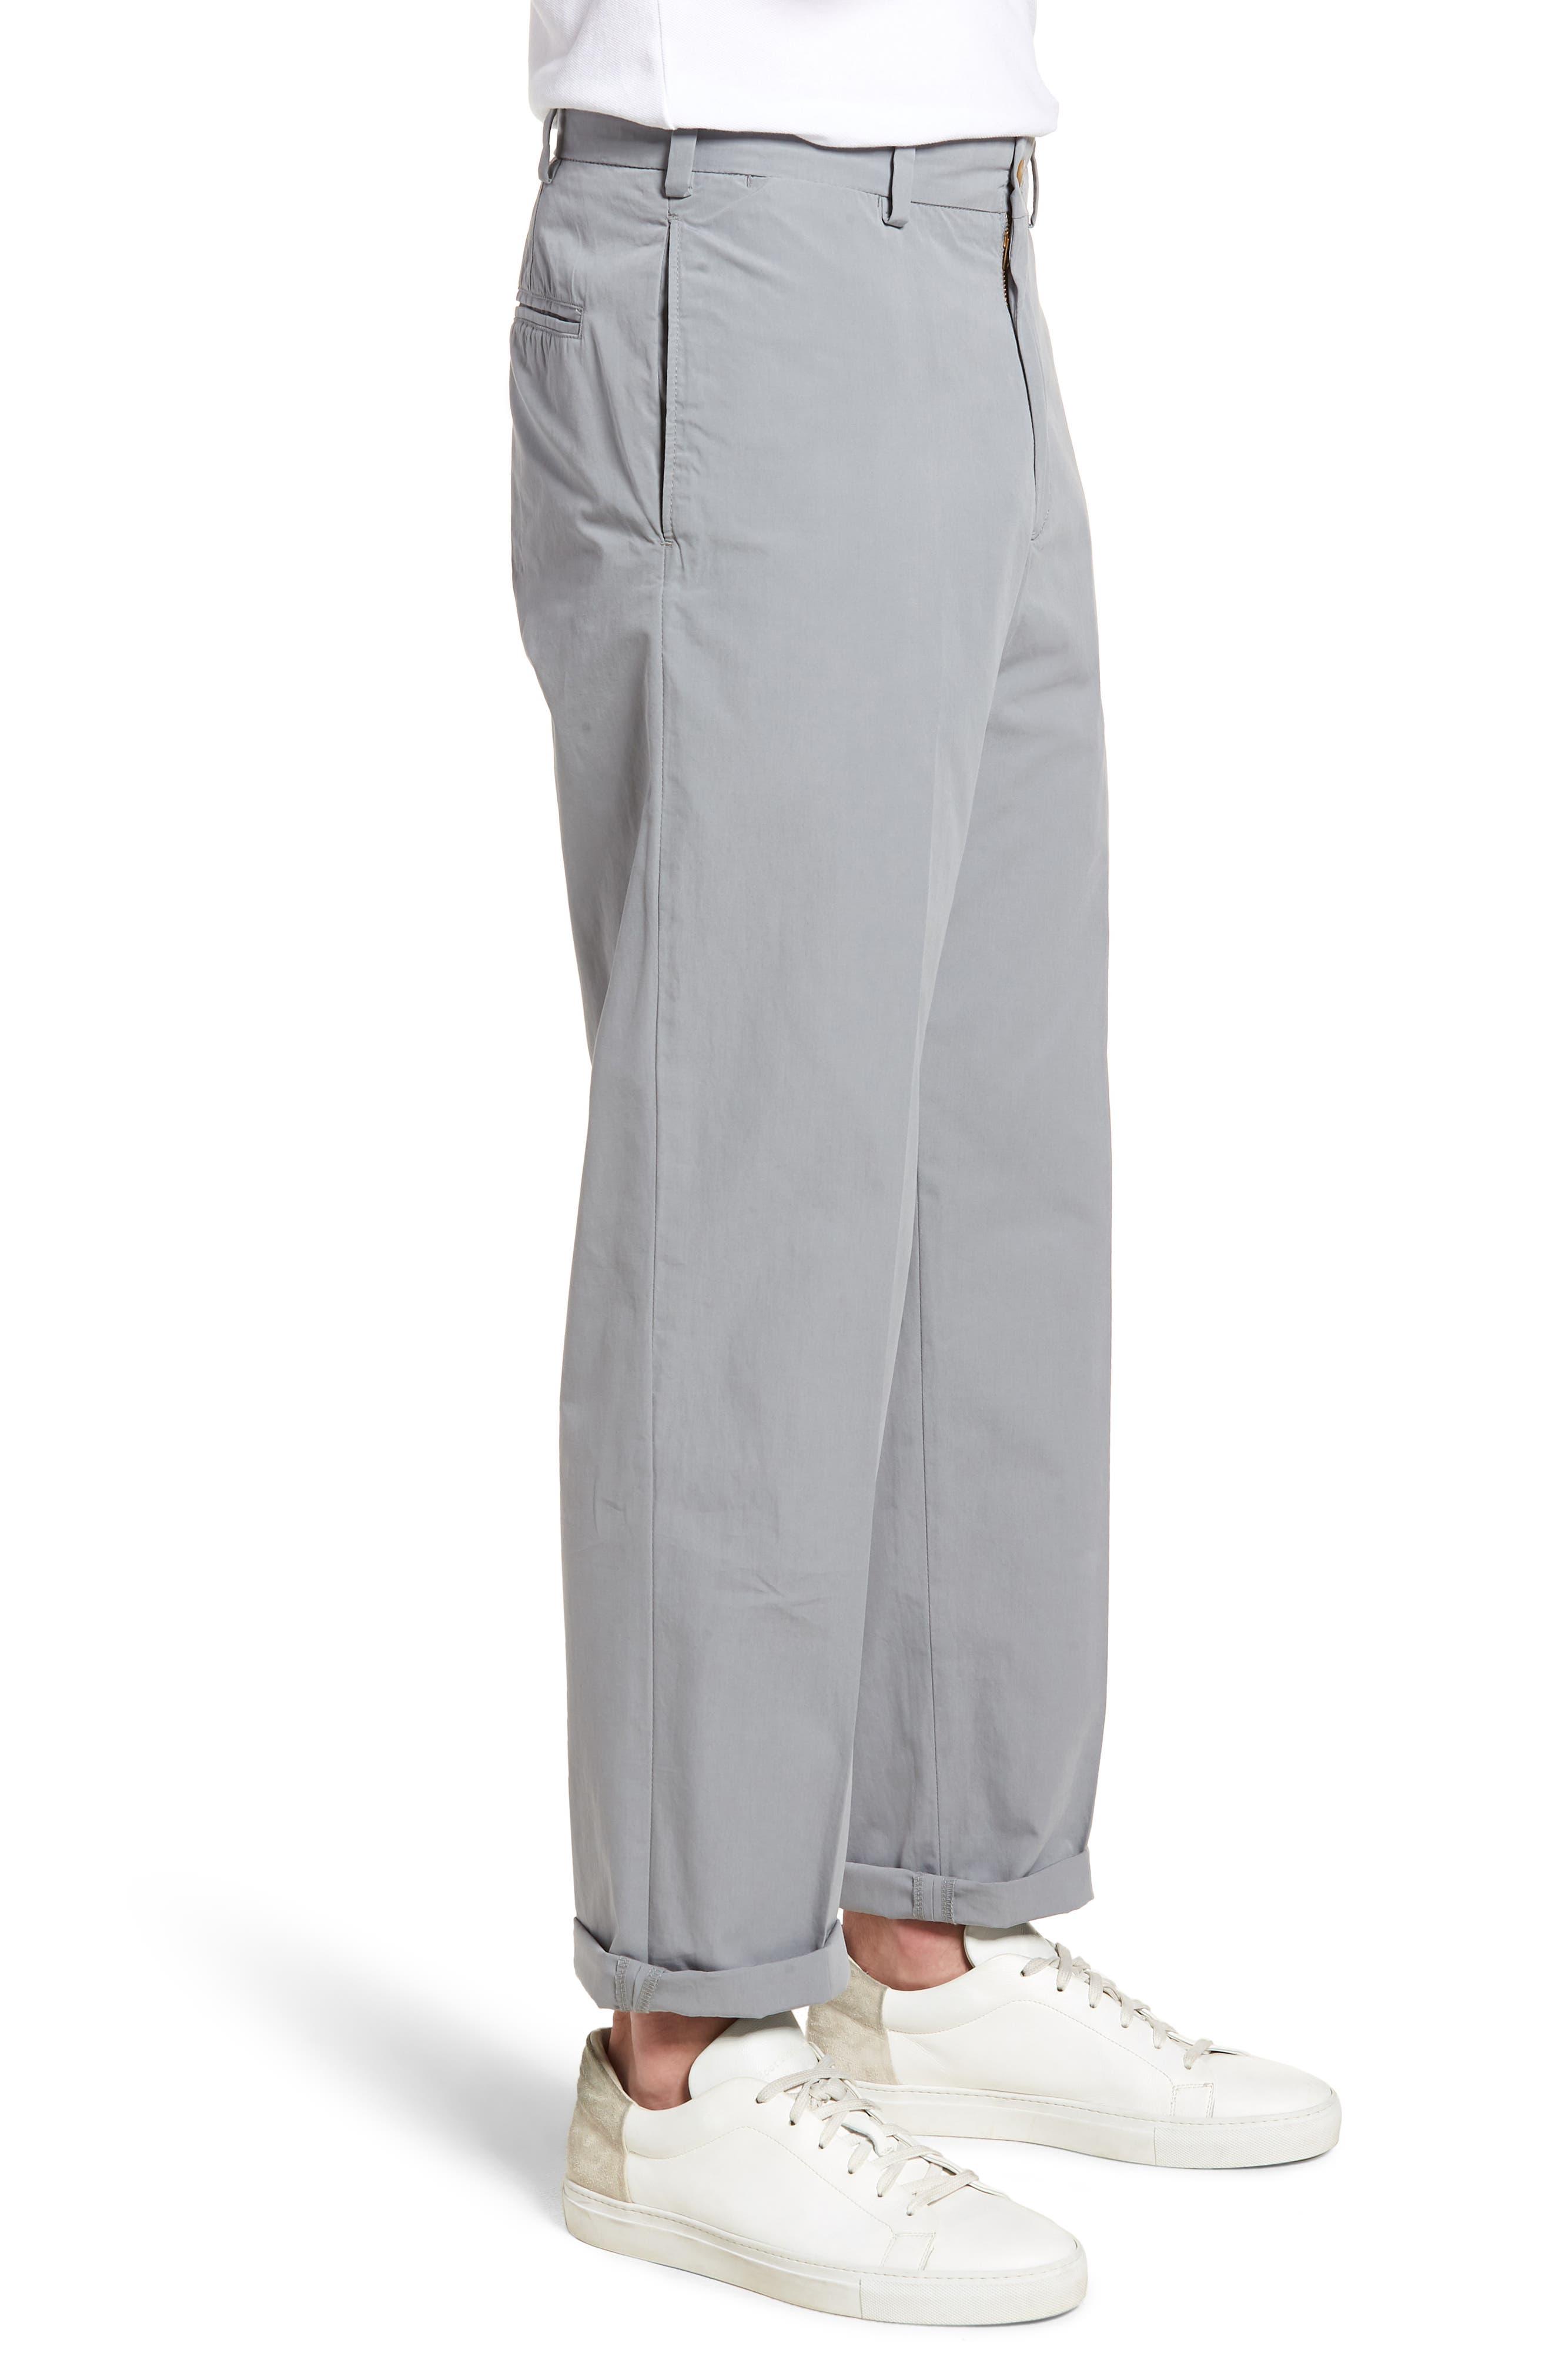 M2 Classic Fit Flat Front Tropical Cotton Poplin Pants,                             Alternate thumbnail 3, color,                             Nickel